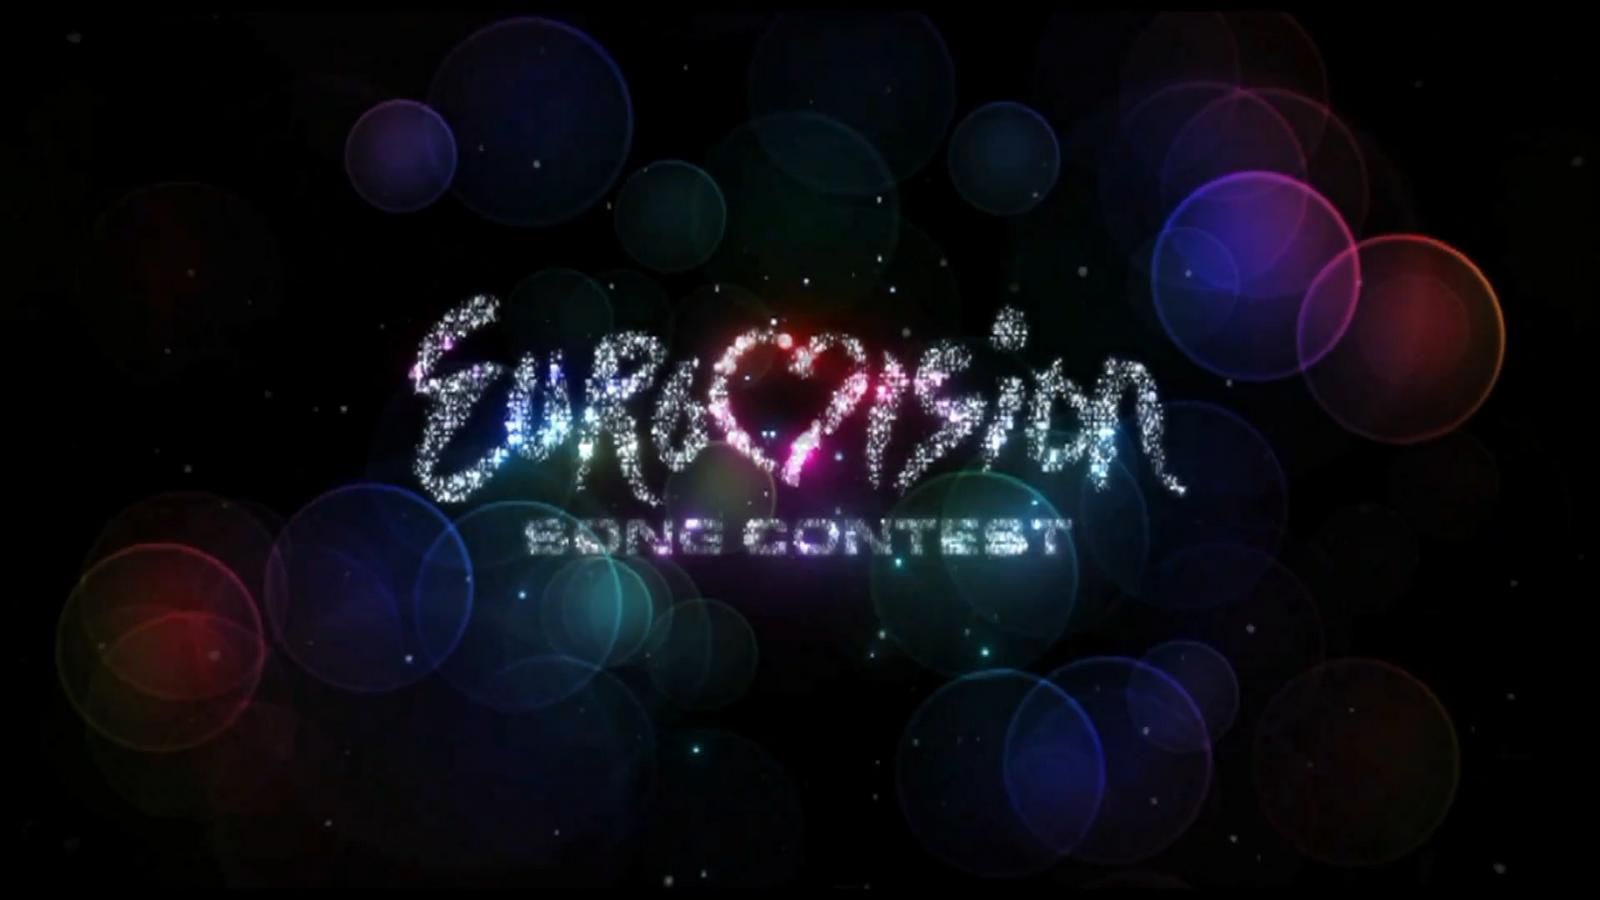 eurovisionbelgium alle deelnemers voor eurovisie songfestival 2011